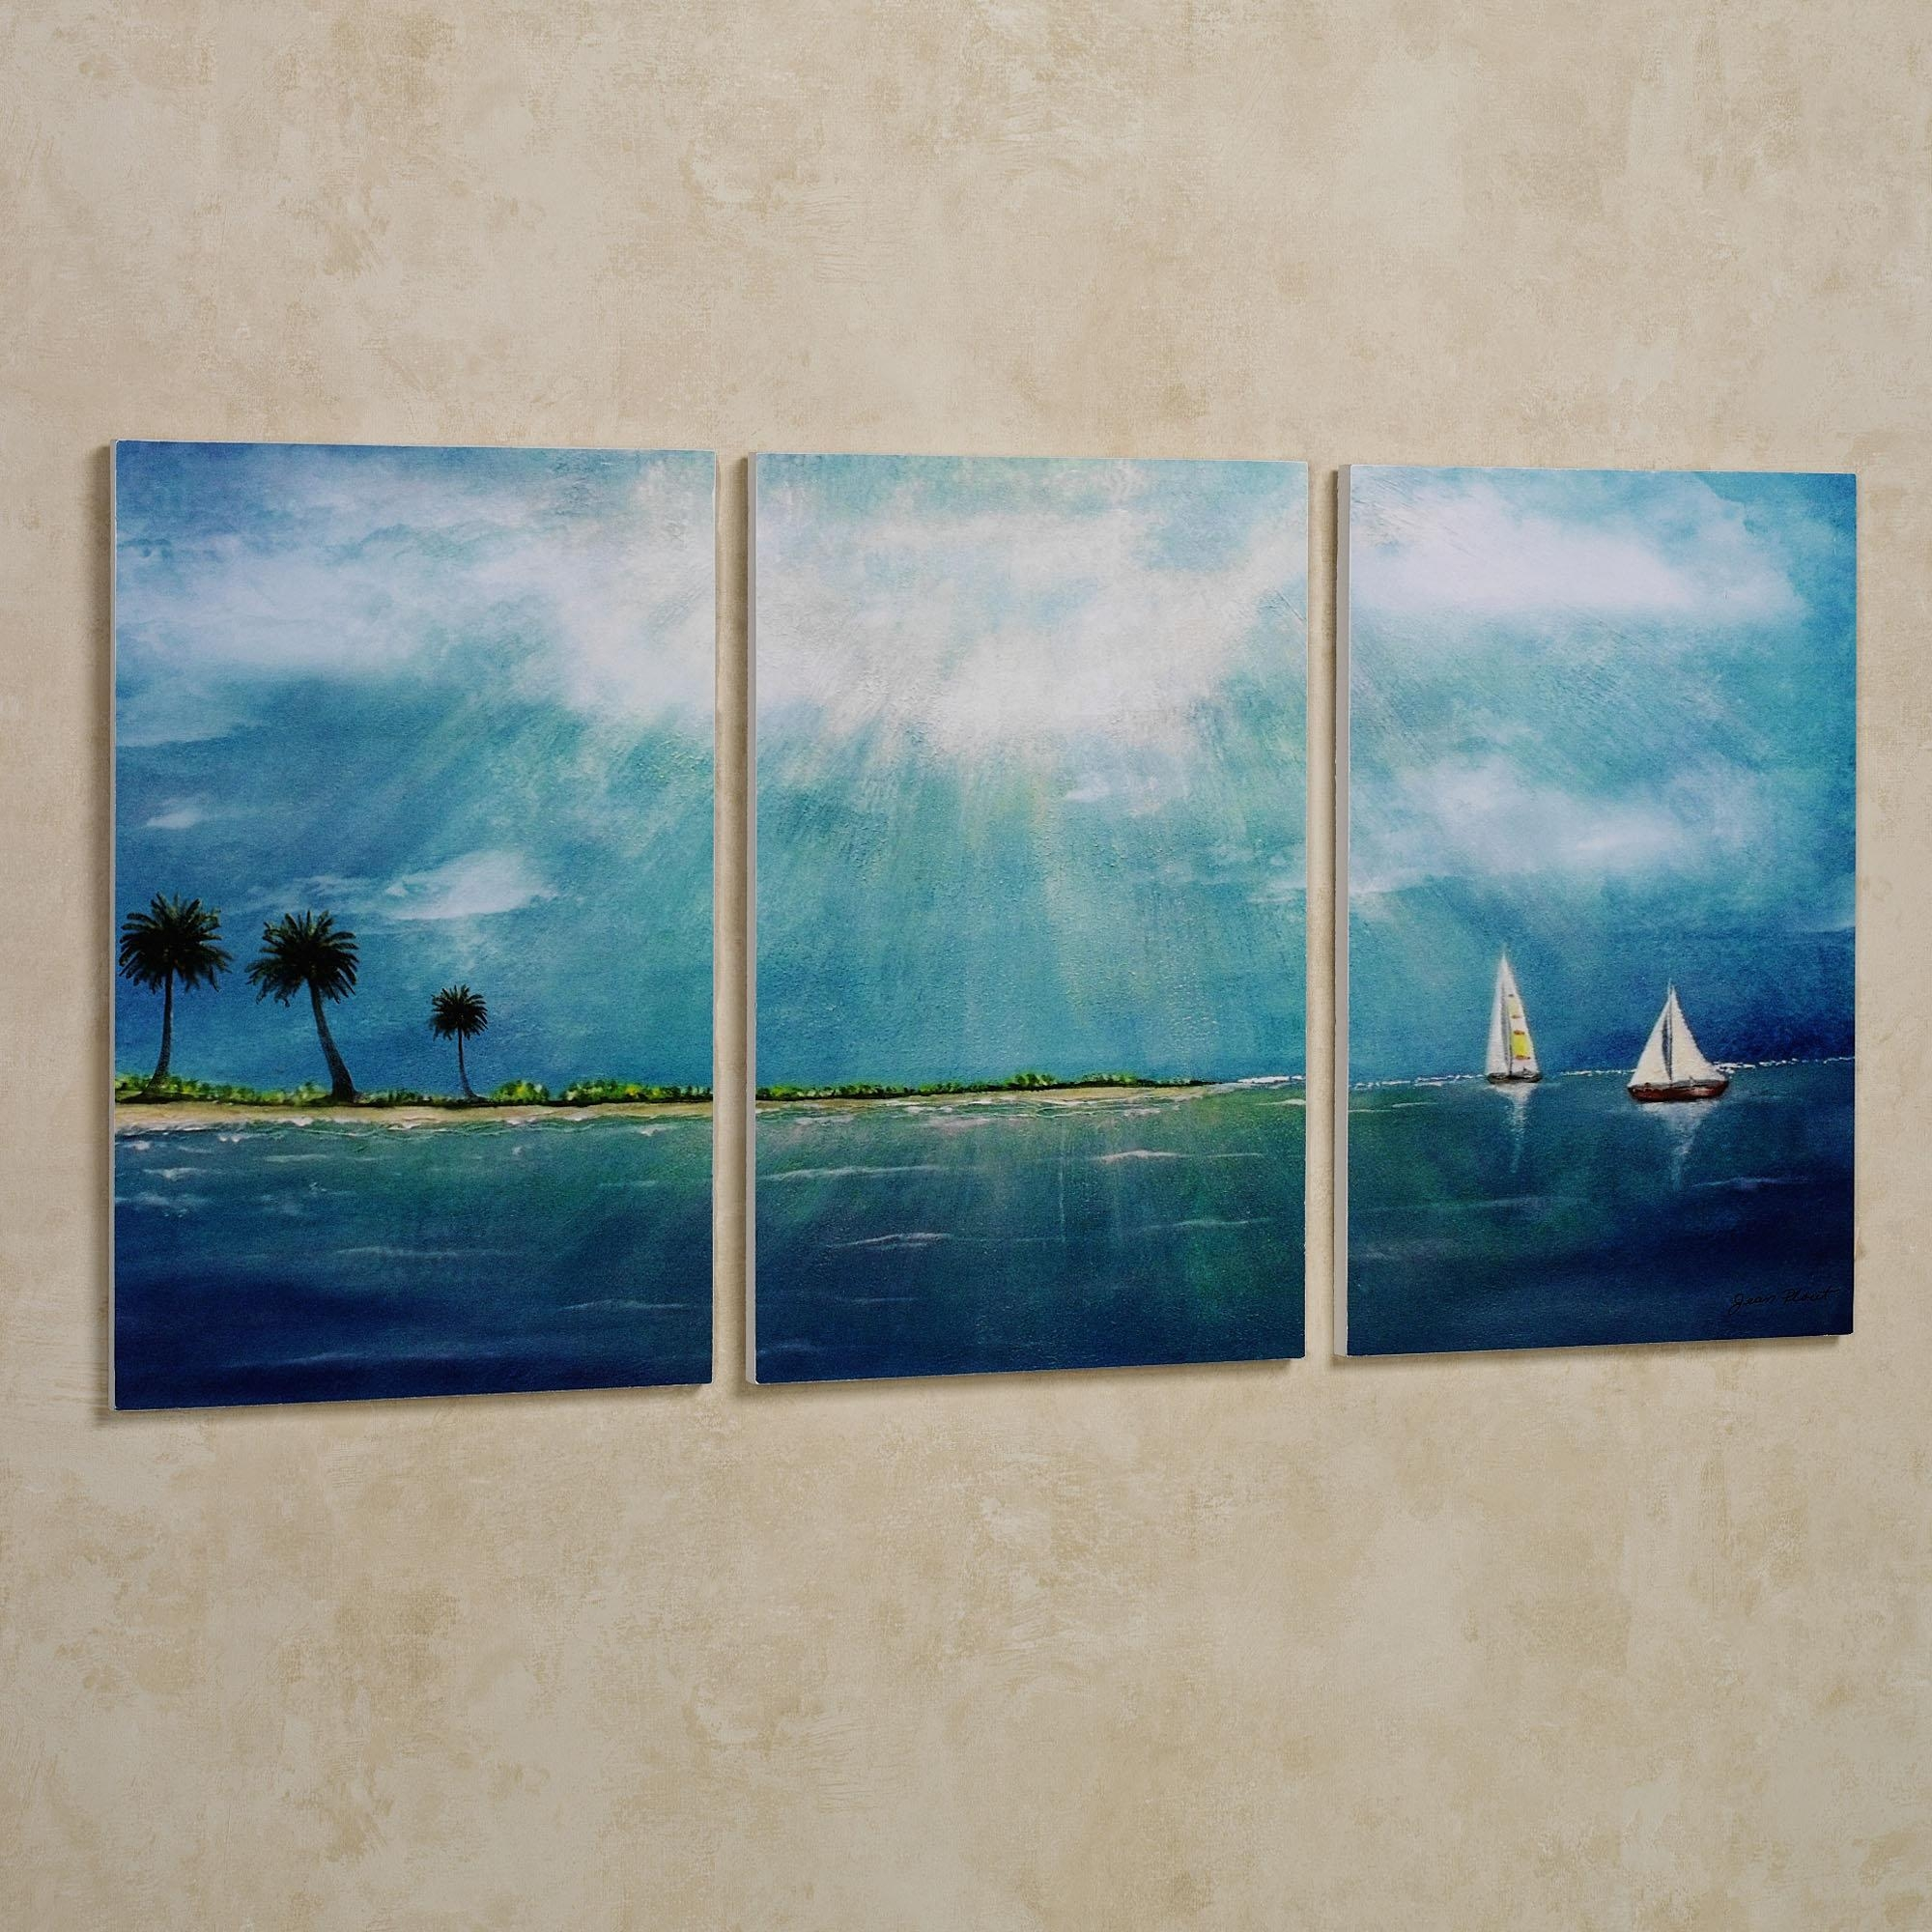 Wall Art Designs: Multi Panel Wall Art Multi Panel Sensual Wall With Regard To Sensual Wall Art (Image 19 of 20)